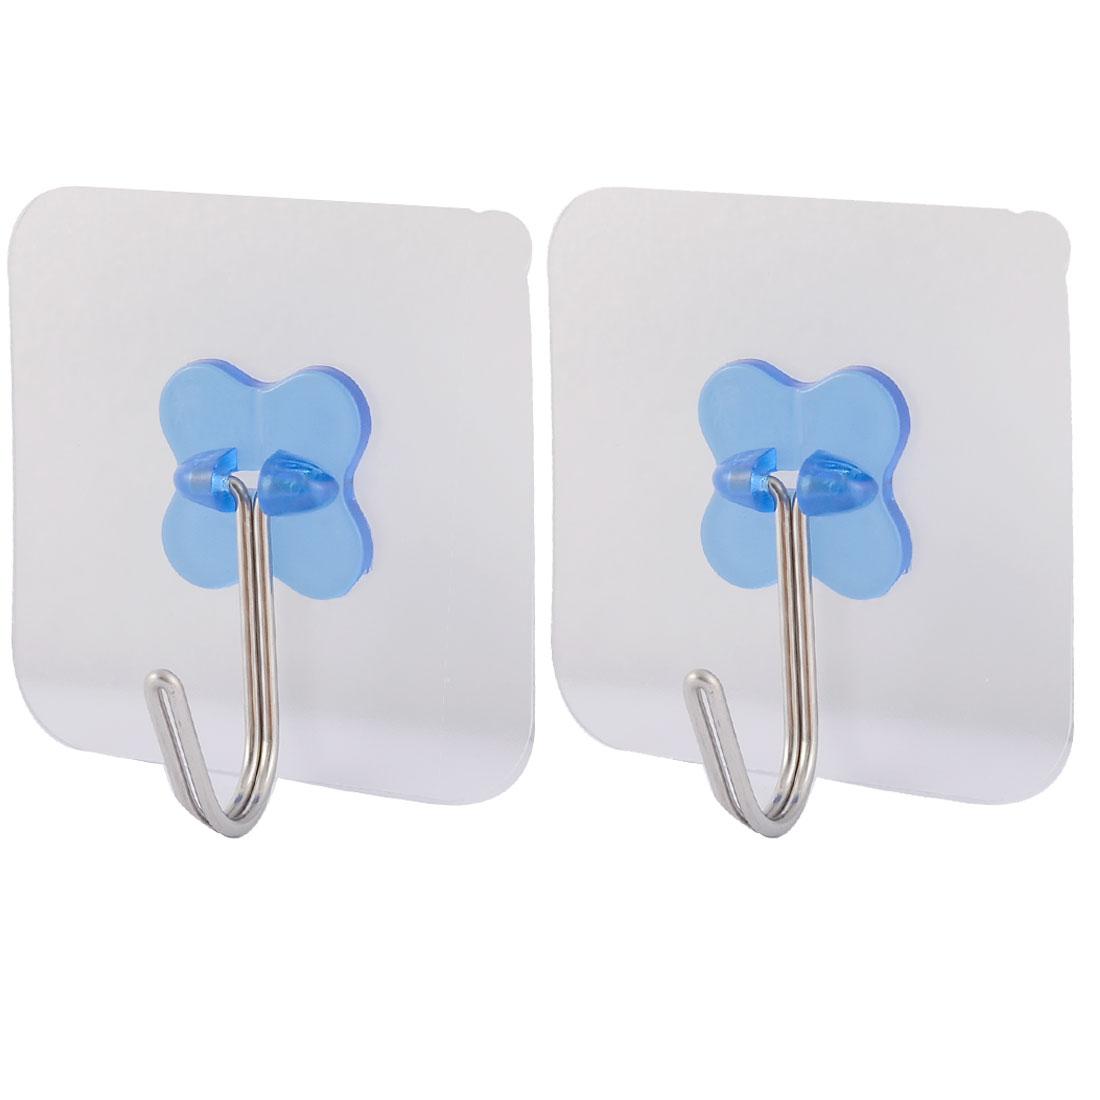 Home Wall Door No Scratch Towel Clothes Hanger Self Adhesive Seamless Hook Blue 2pcs